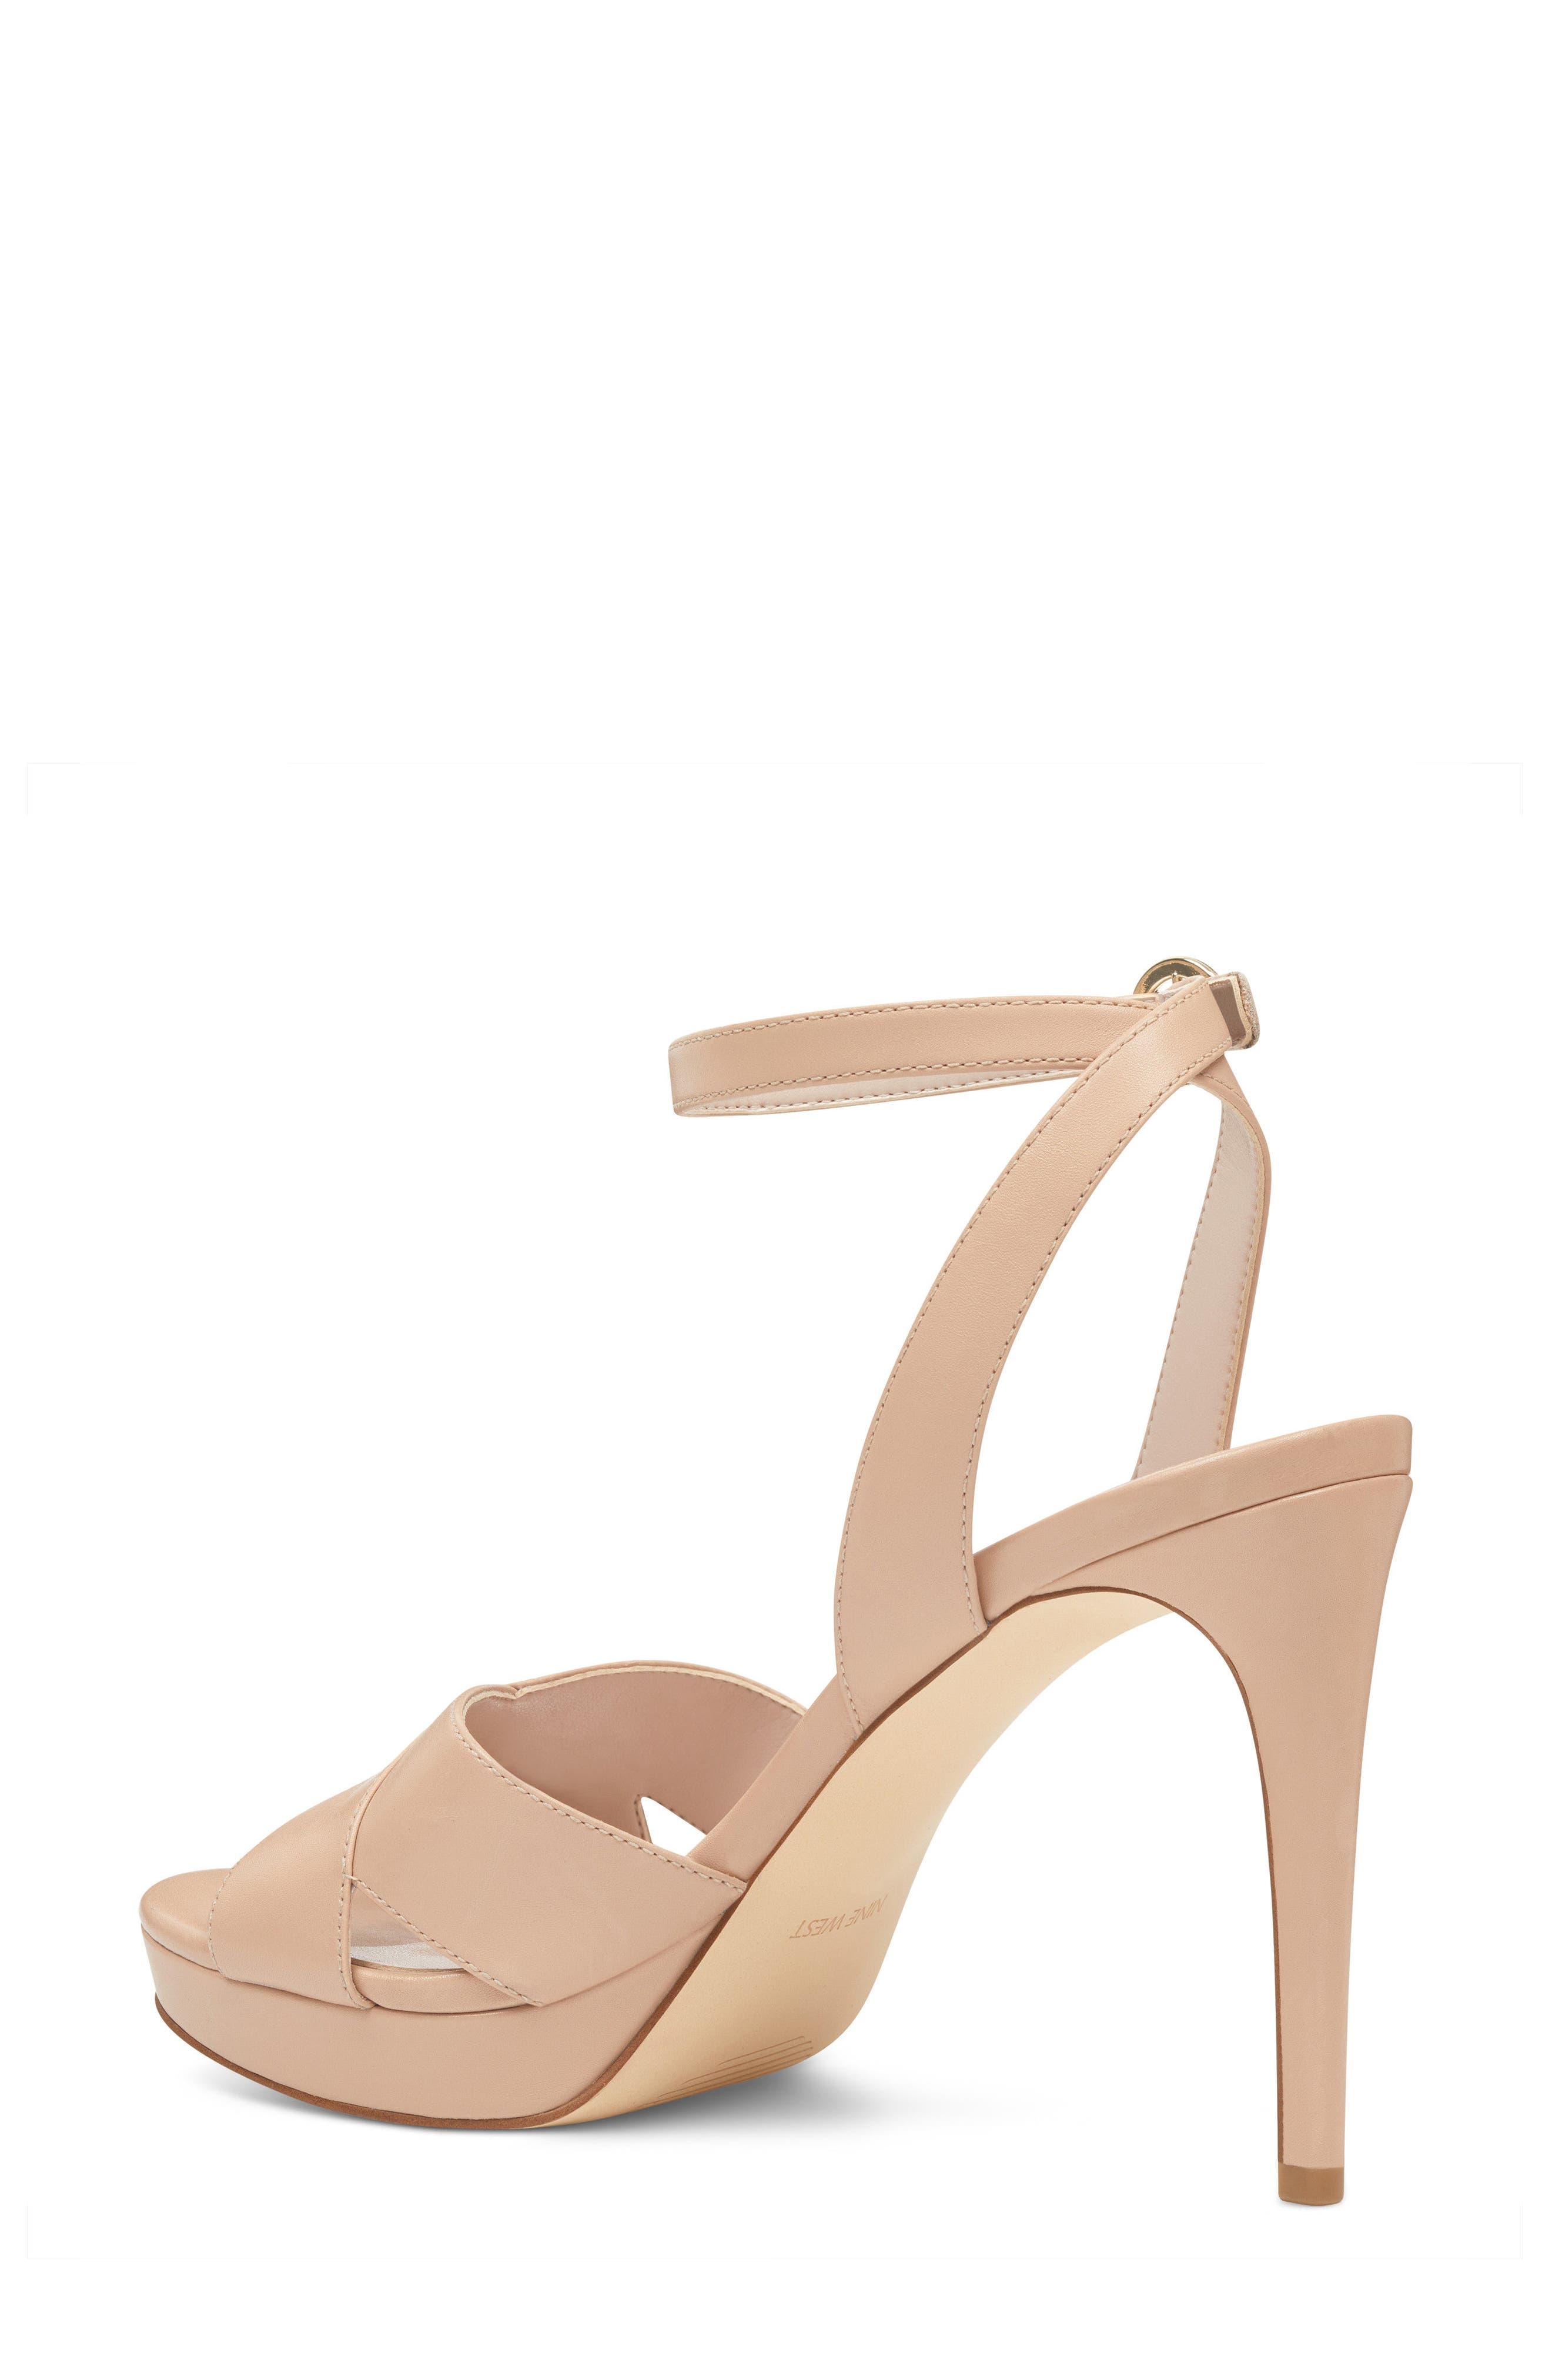 Quisha Ankle Strap Sandal,                             Alternate thumbnail 2, color,                             LIGHT NATURAL LEATHER